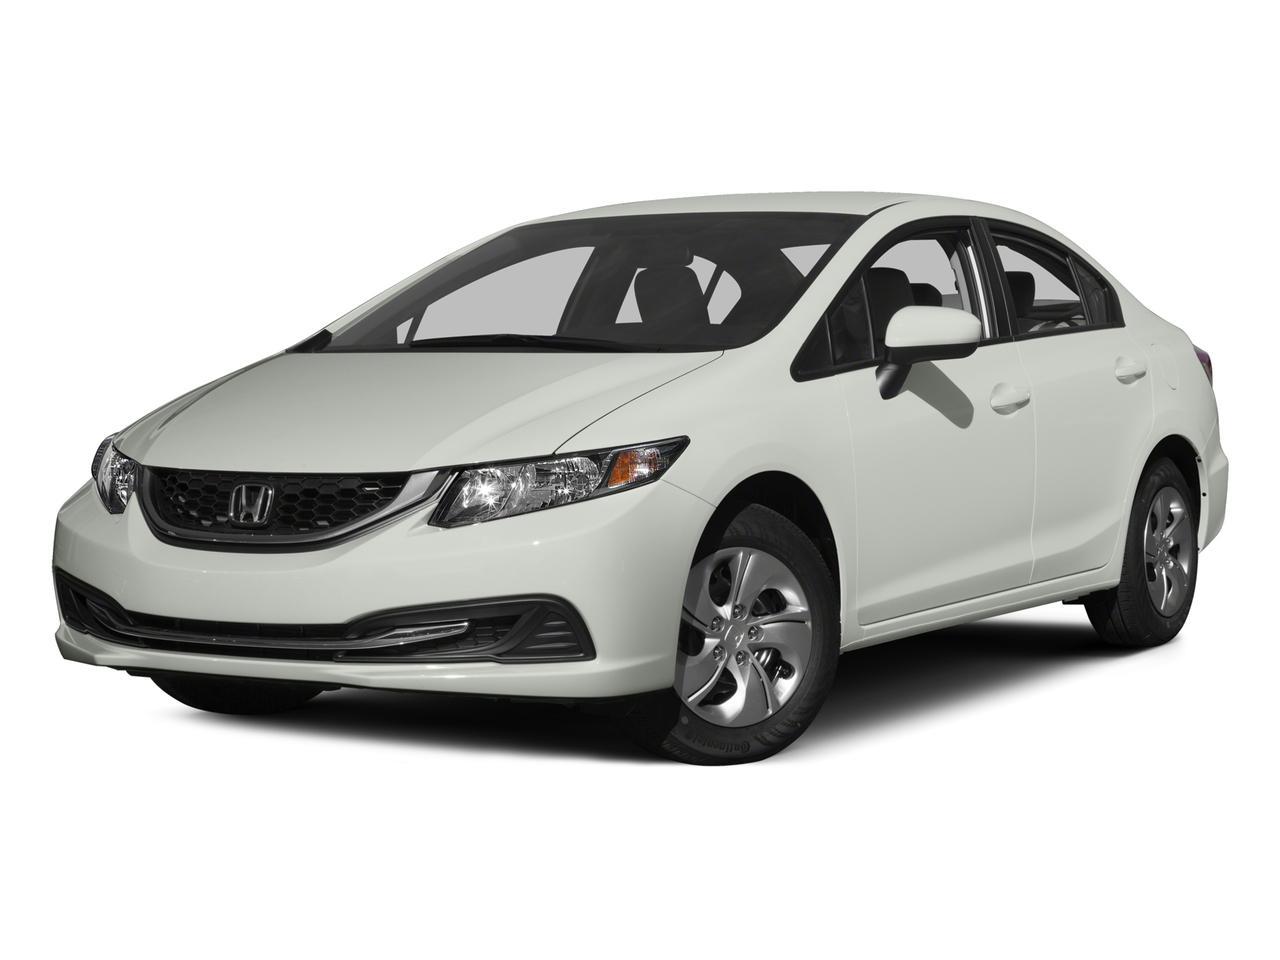 2015 Honda Civic Sedan Vehicle Photo in Denver, CO 80123